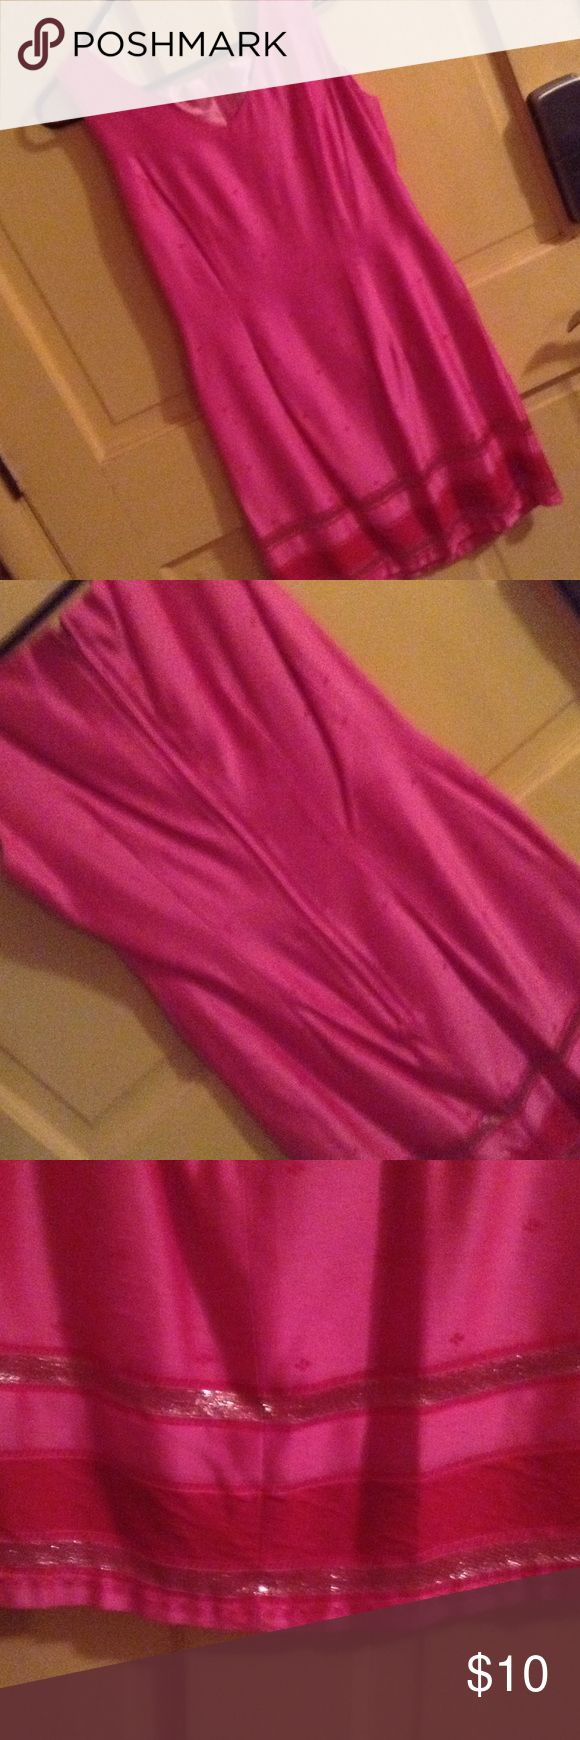 Ladies dress. Be Smart brand Mini dress pink with gold braid and red lace on hem. Zip back, v neck Dresses Mini